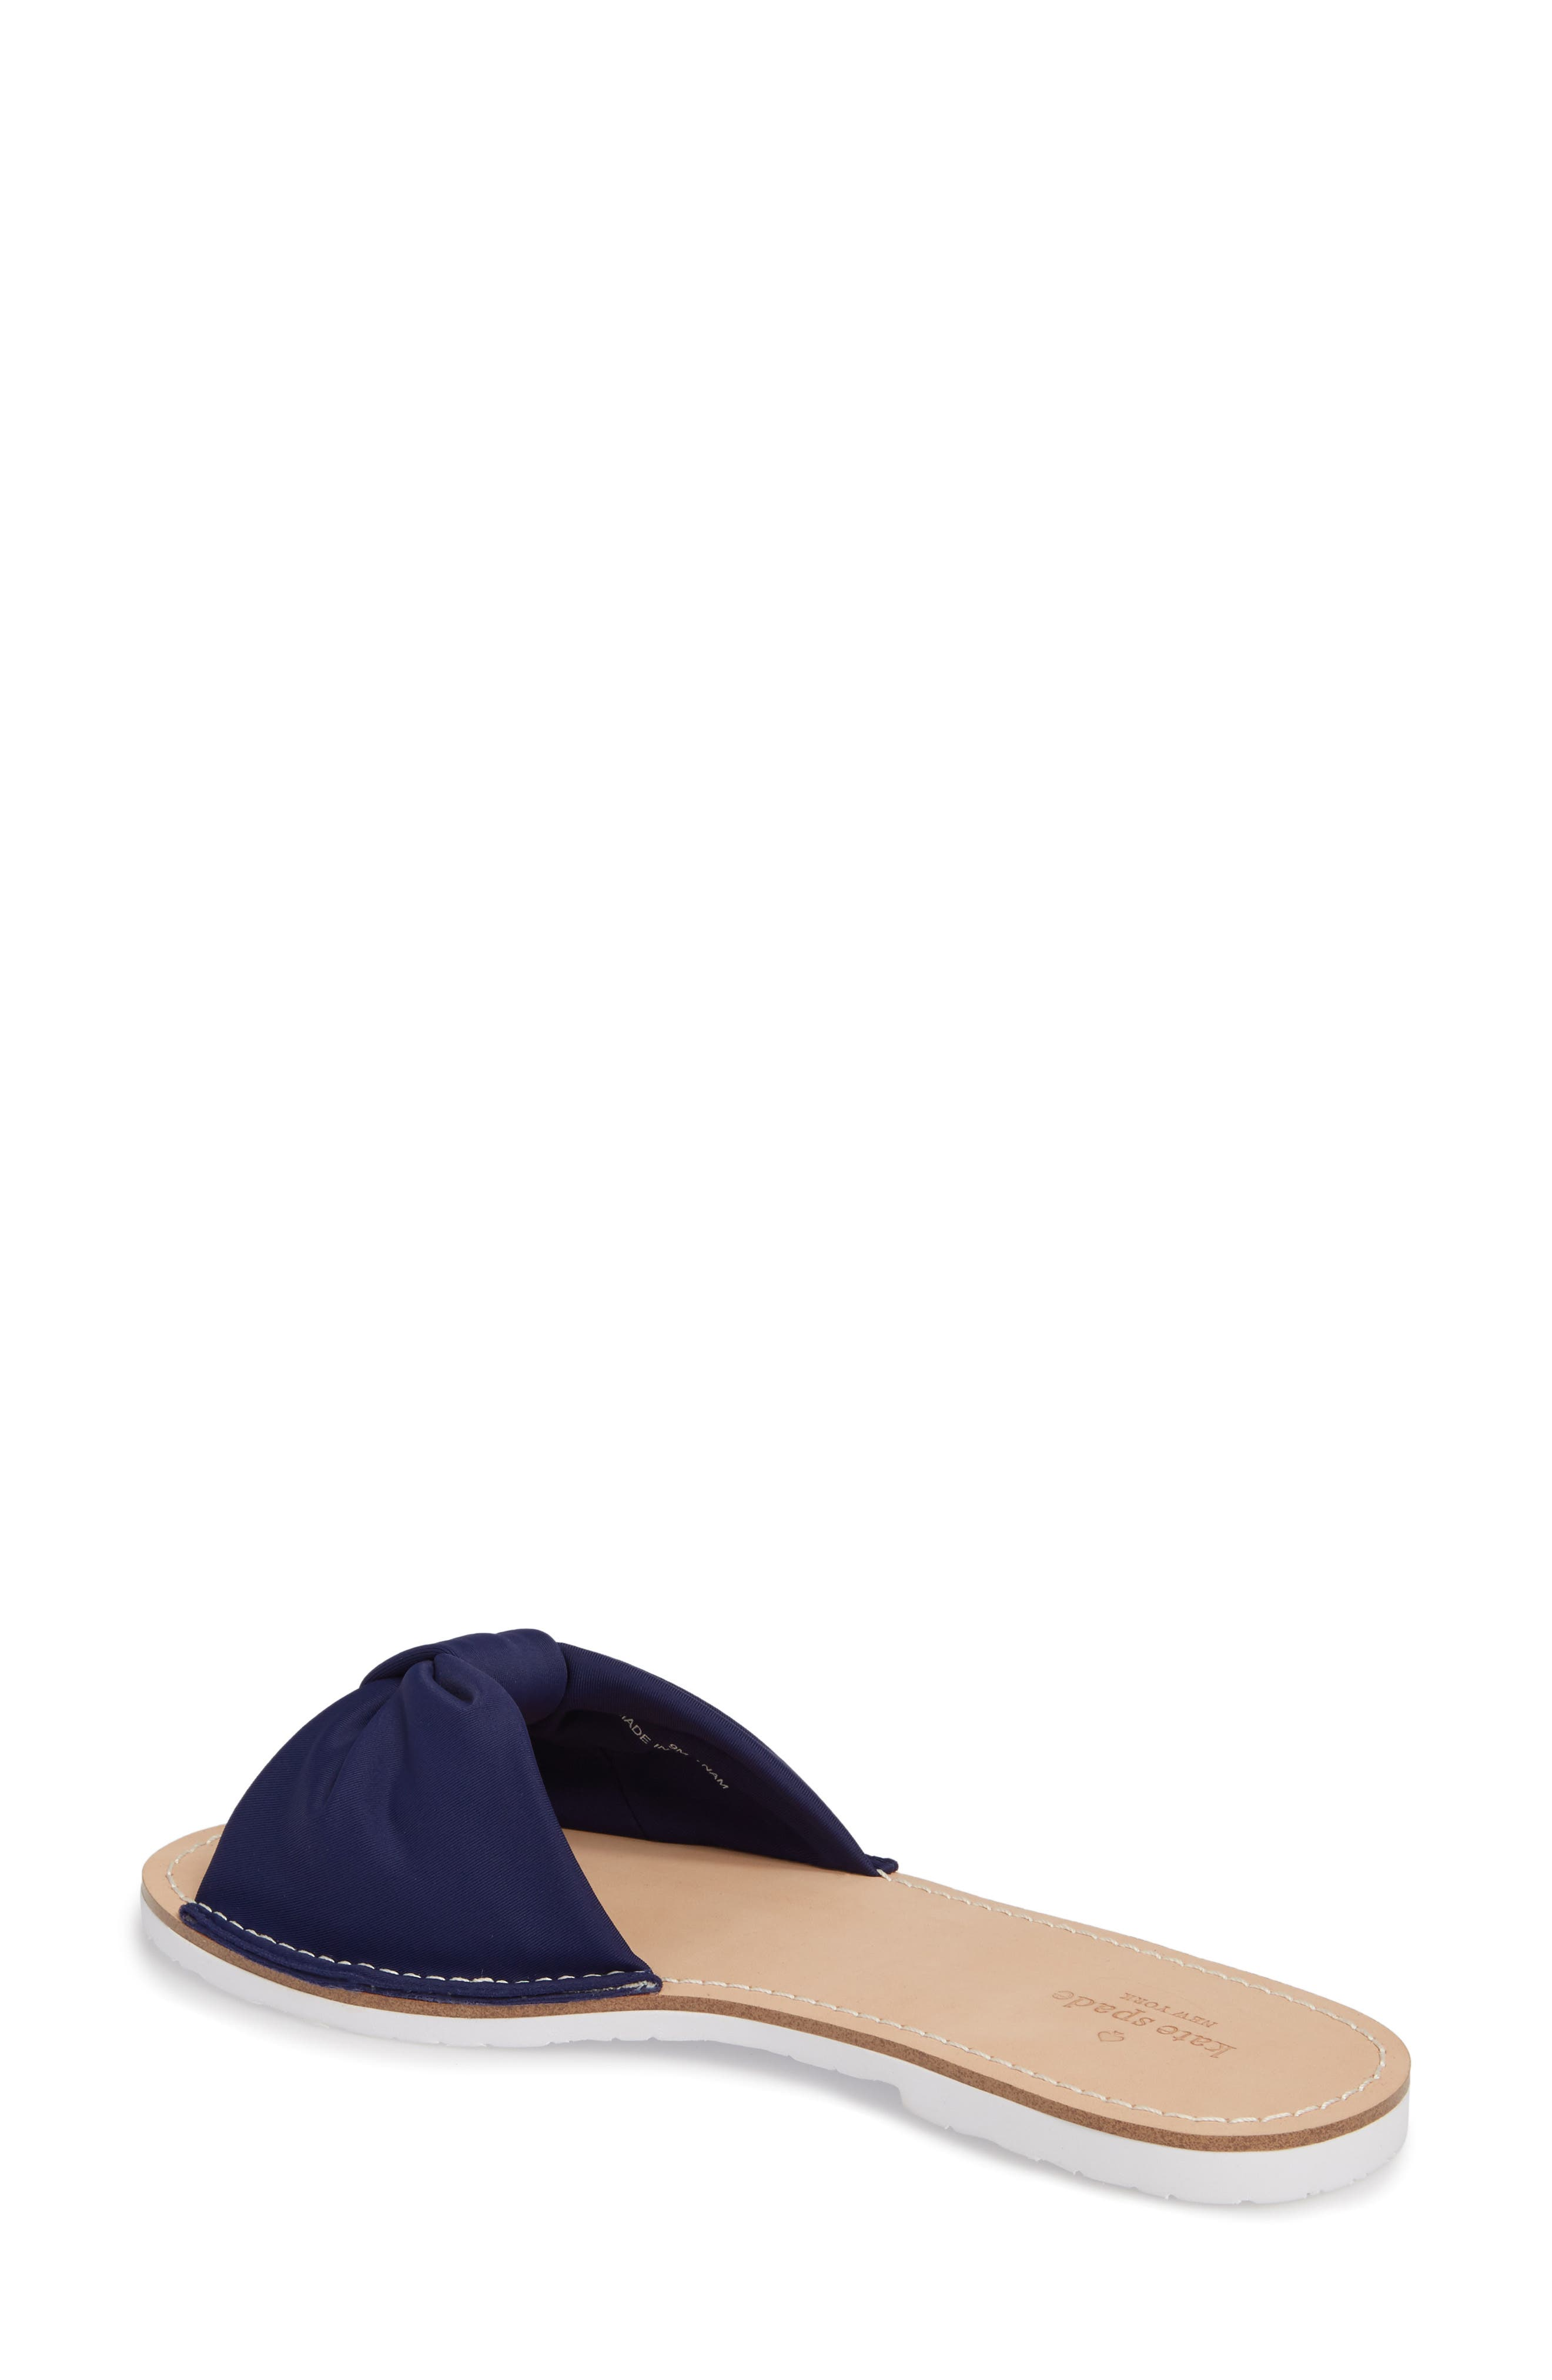 indi slide sandal,                             Alternate thumbnail 5, color,